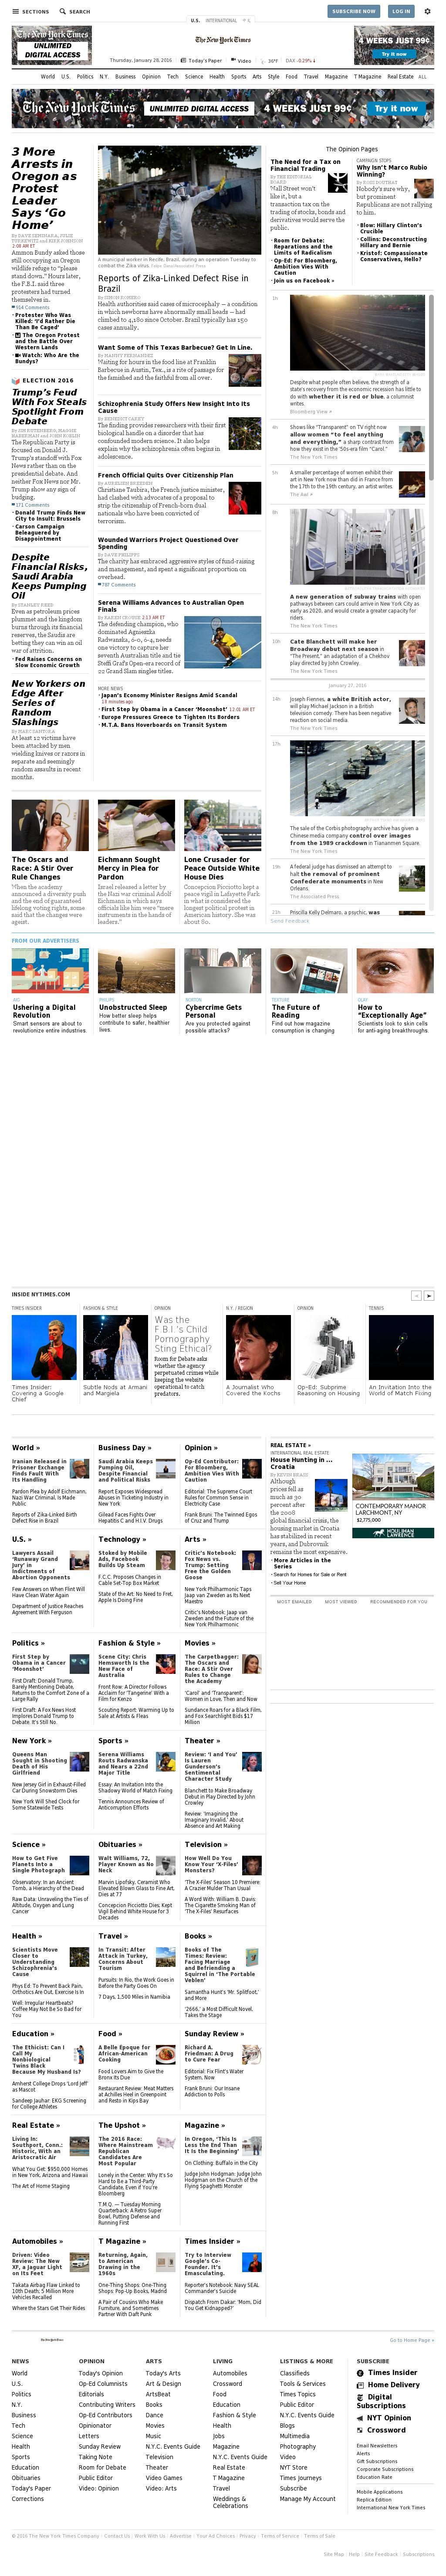 The New York Times at Thursday Jan. 28, 2016, 10:19 a.m. UTC